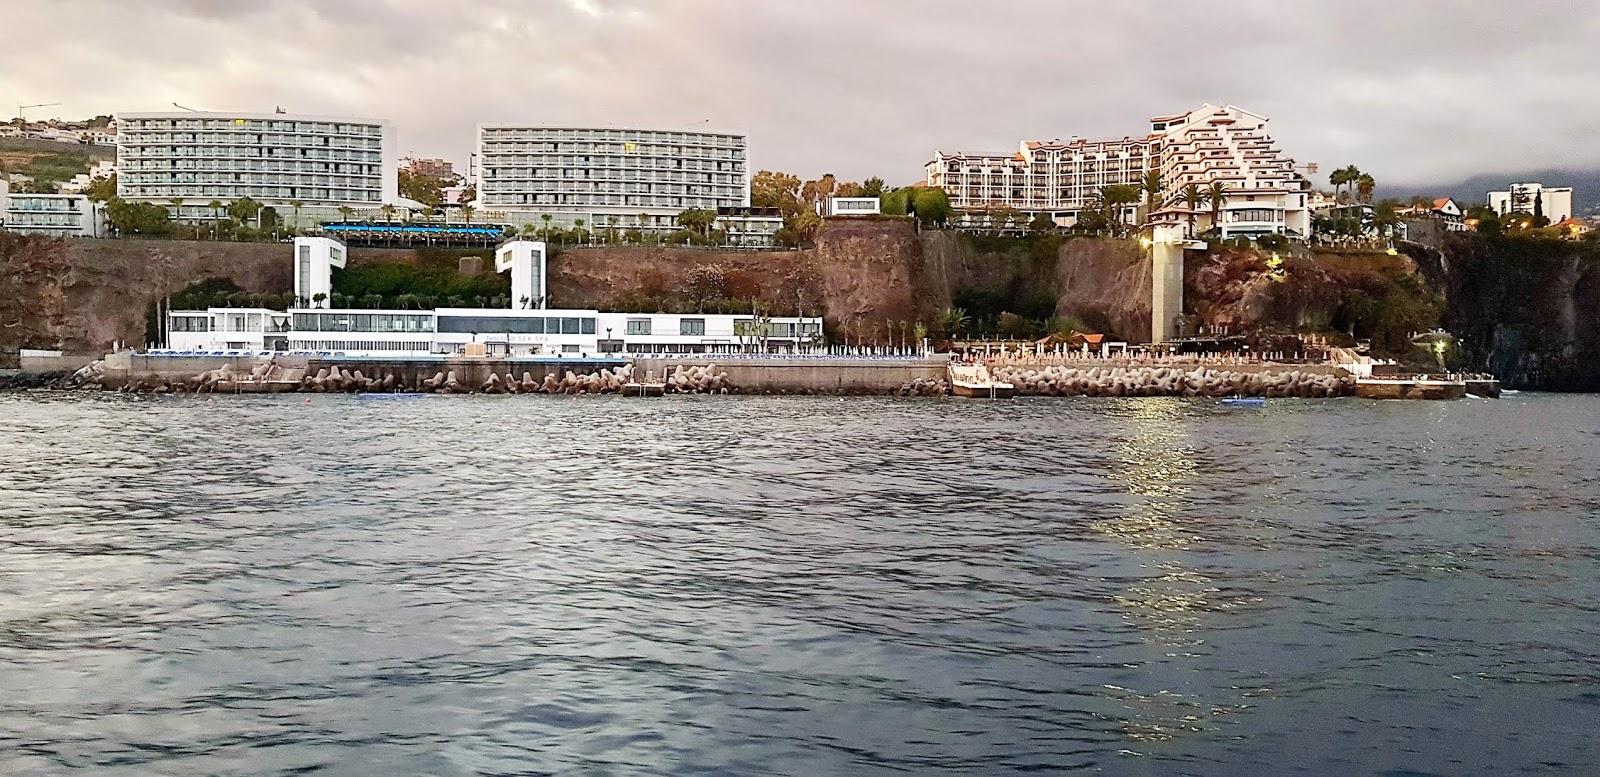 os hotéis e o mar